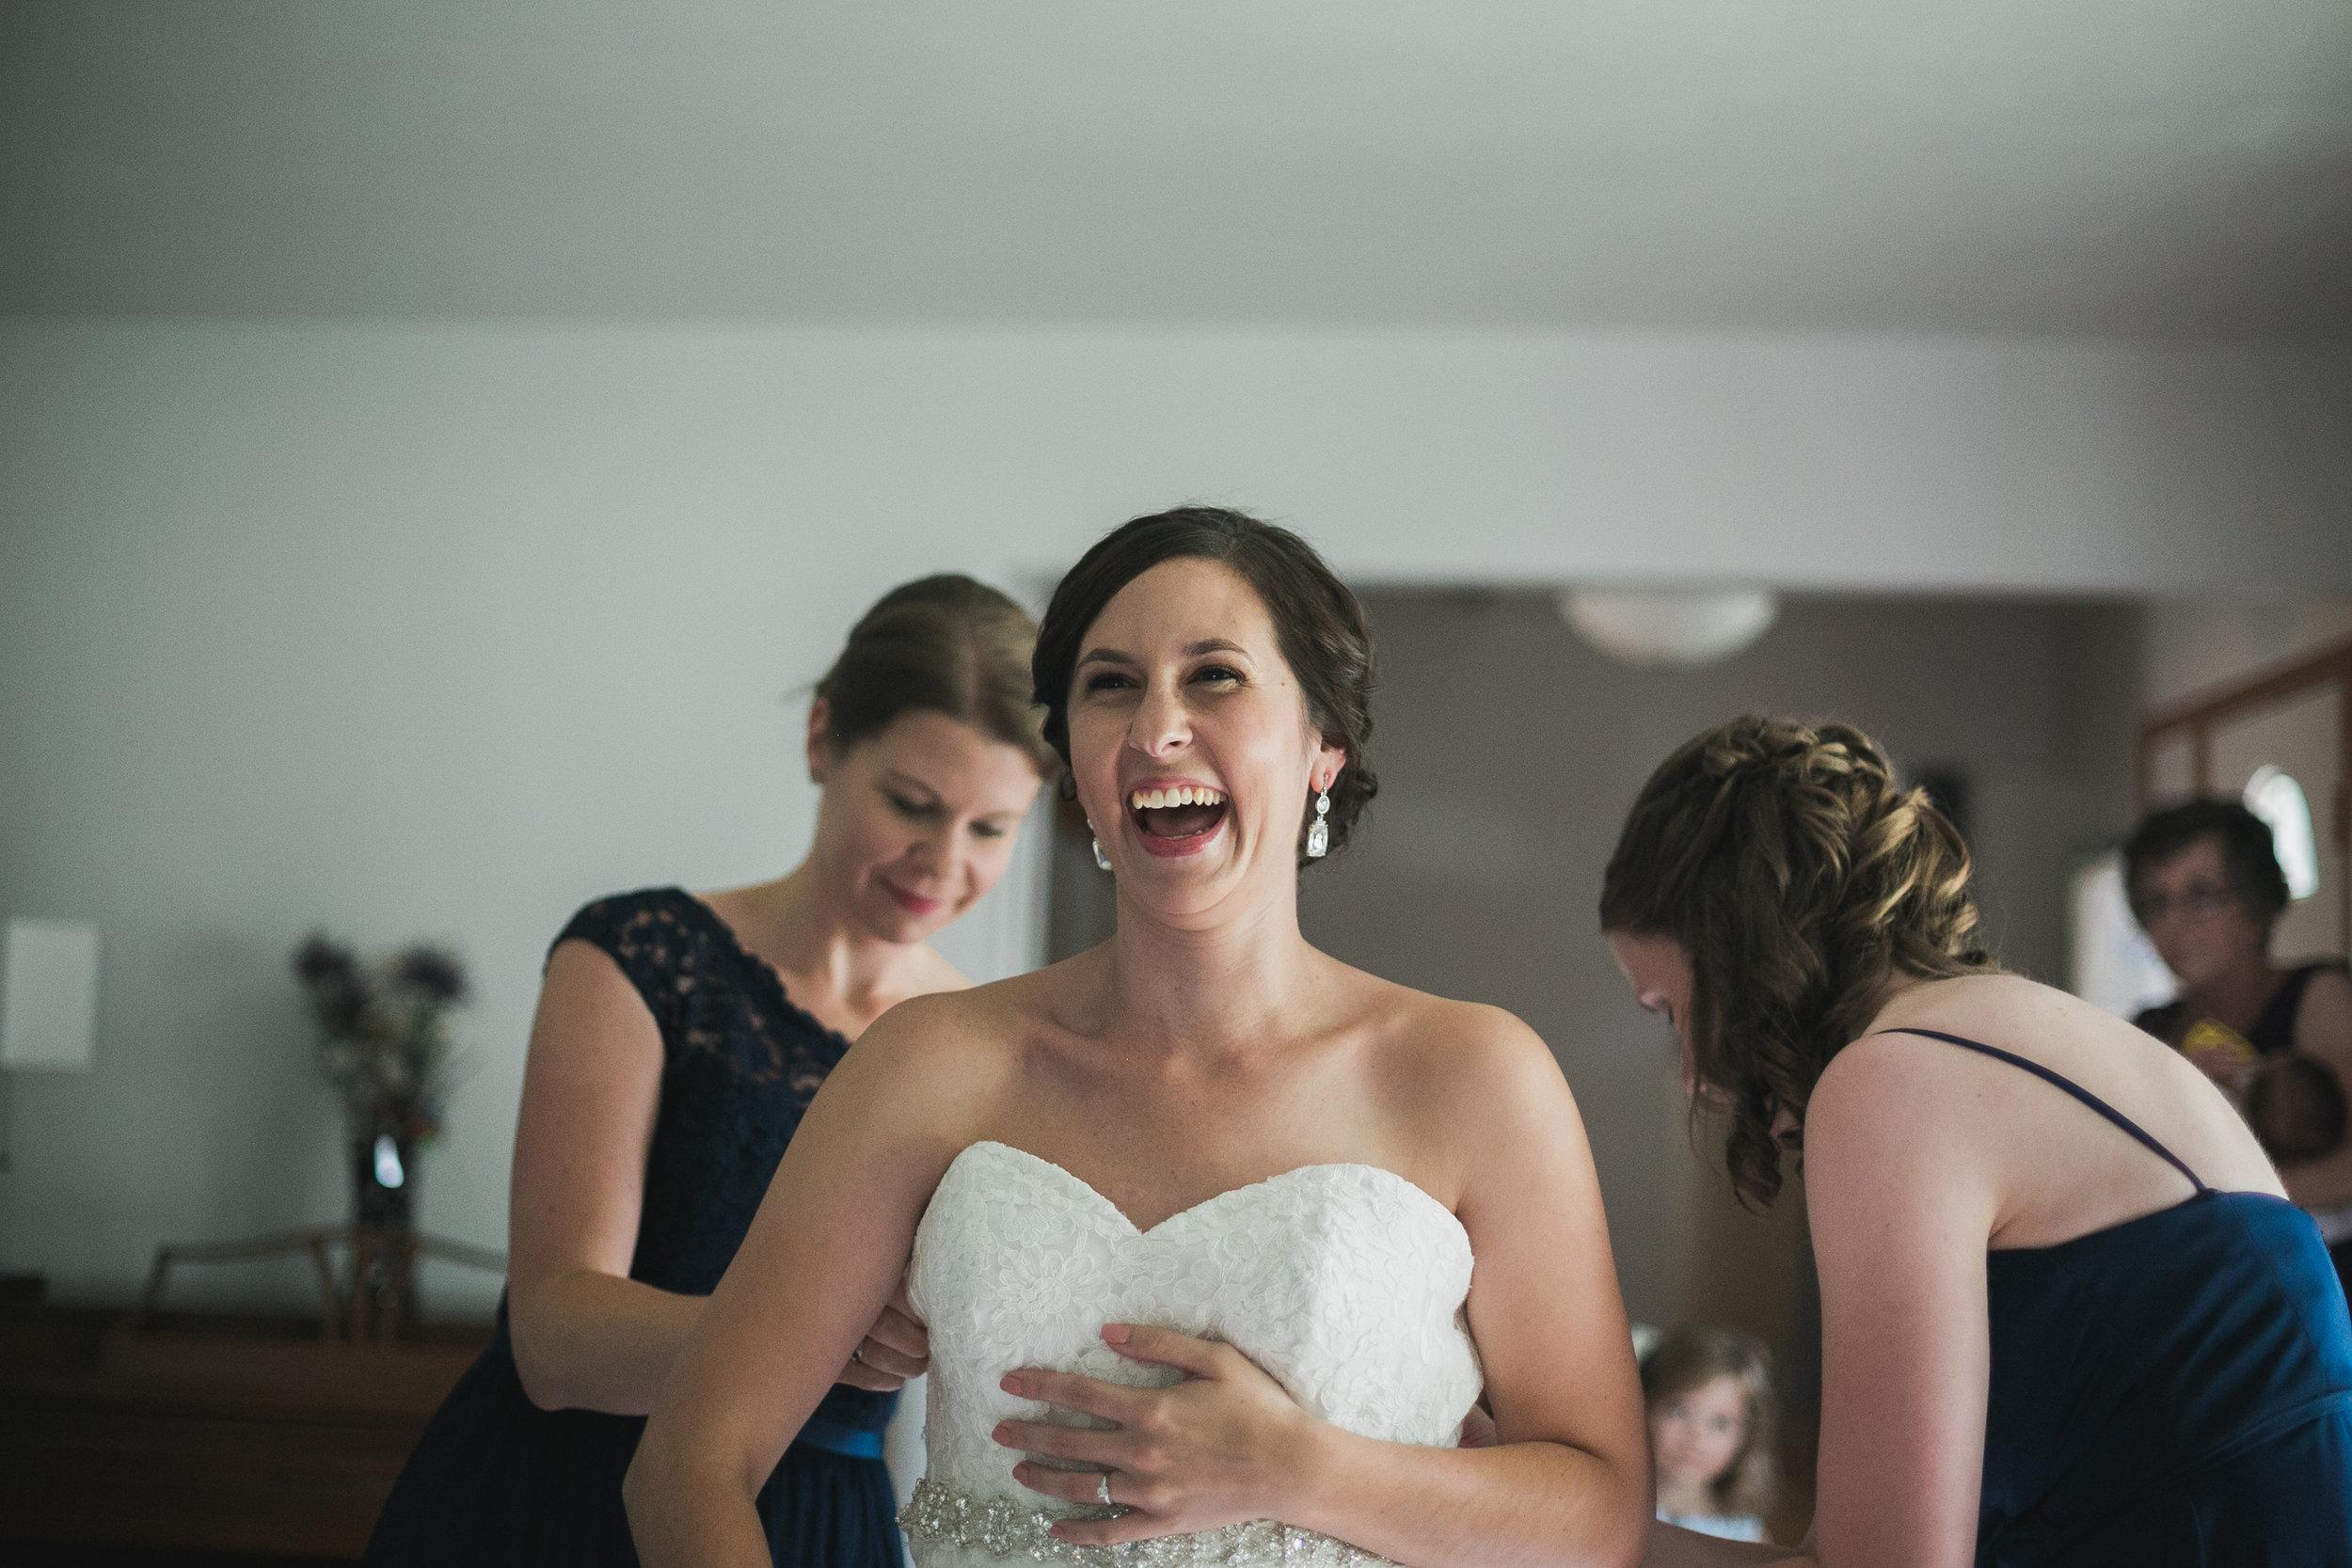 wisconsin-wedding-acowsay-uttke-photography-12.jpg